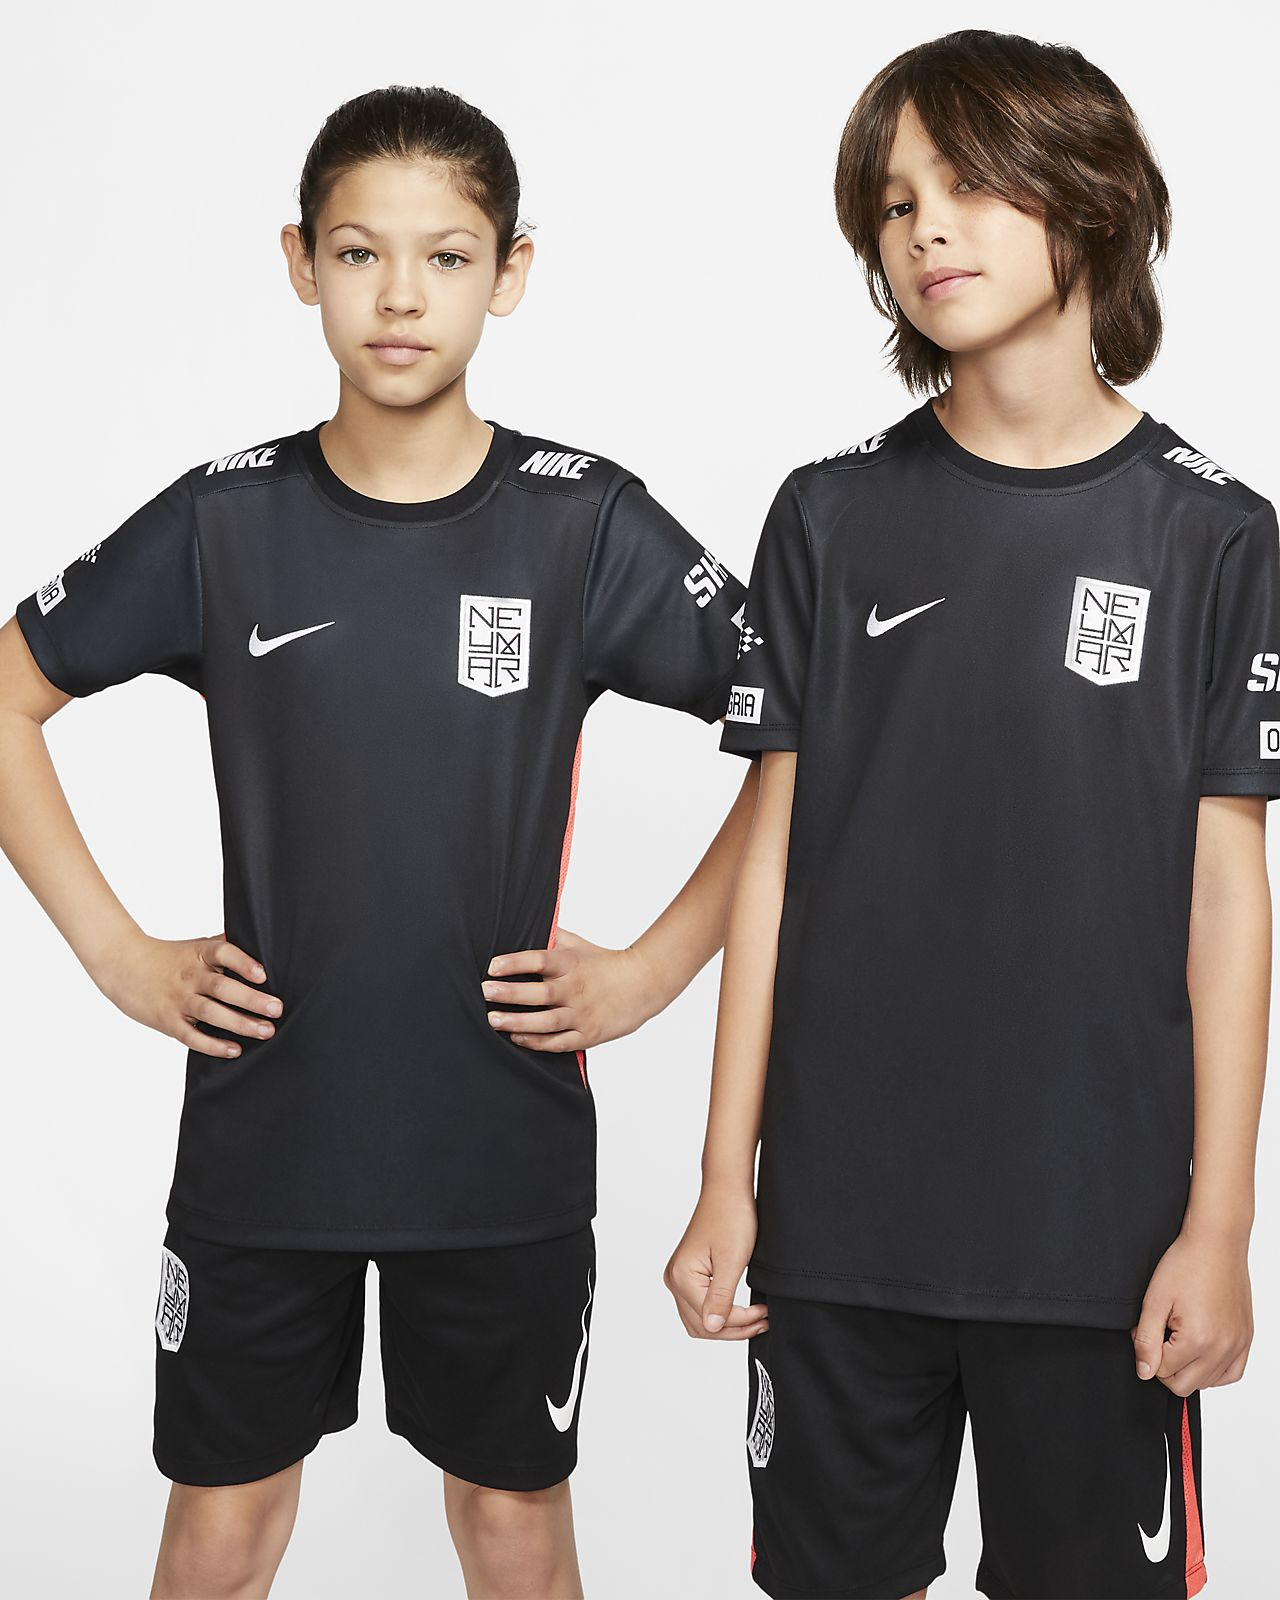 Prenda para la parte superior de fútbol de manga corta para niño talla grande Nike Dri-FIT Neymar Jr.